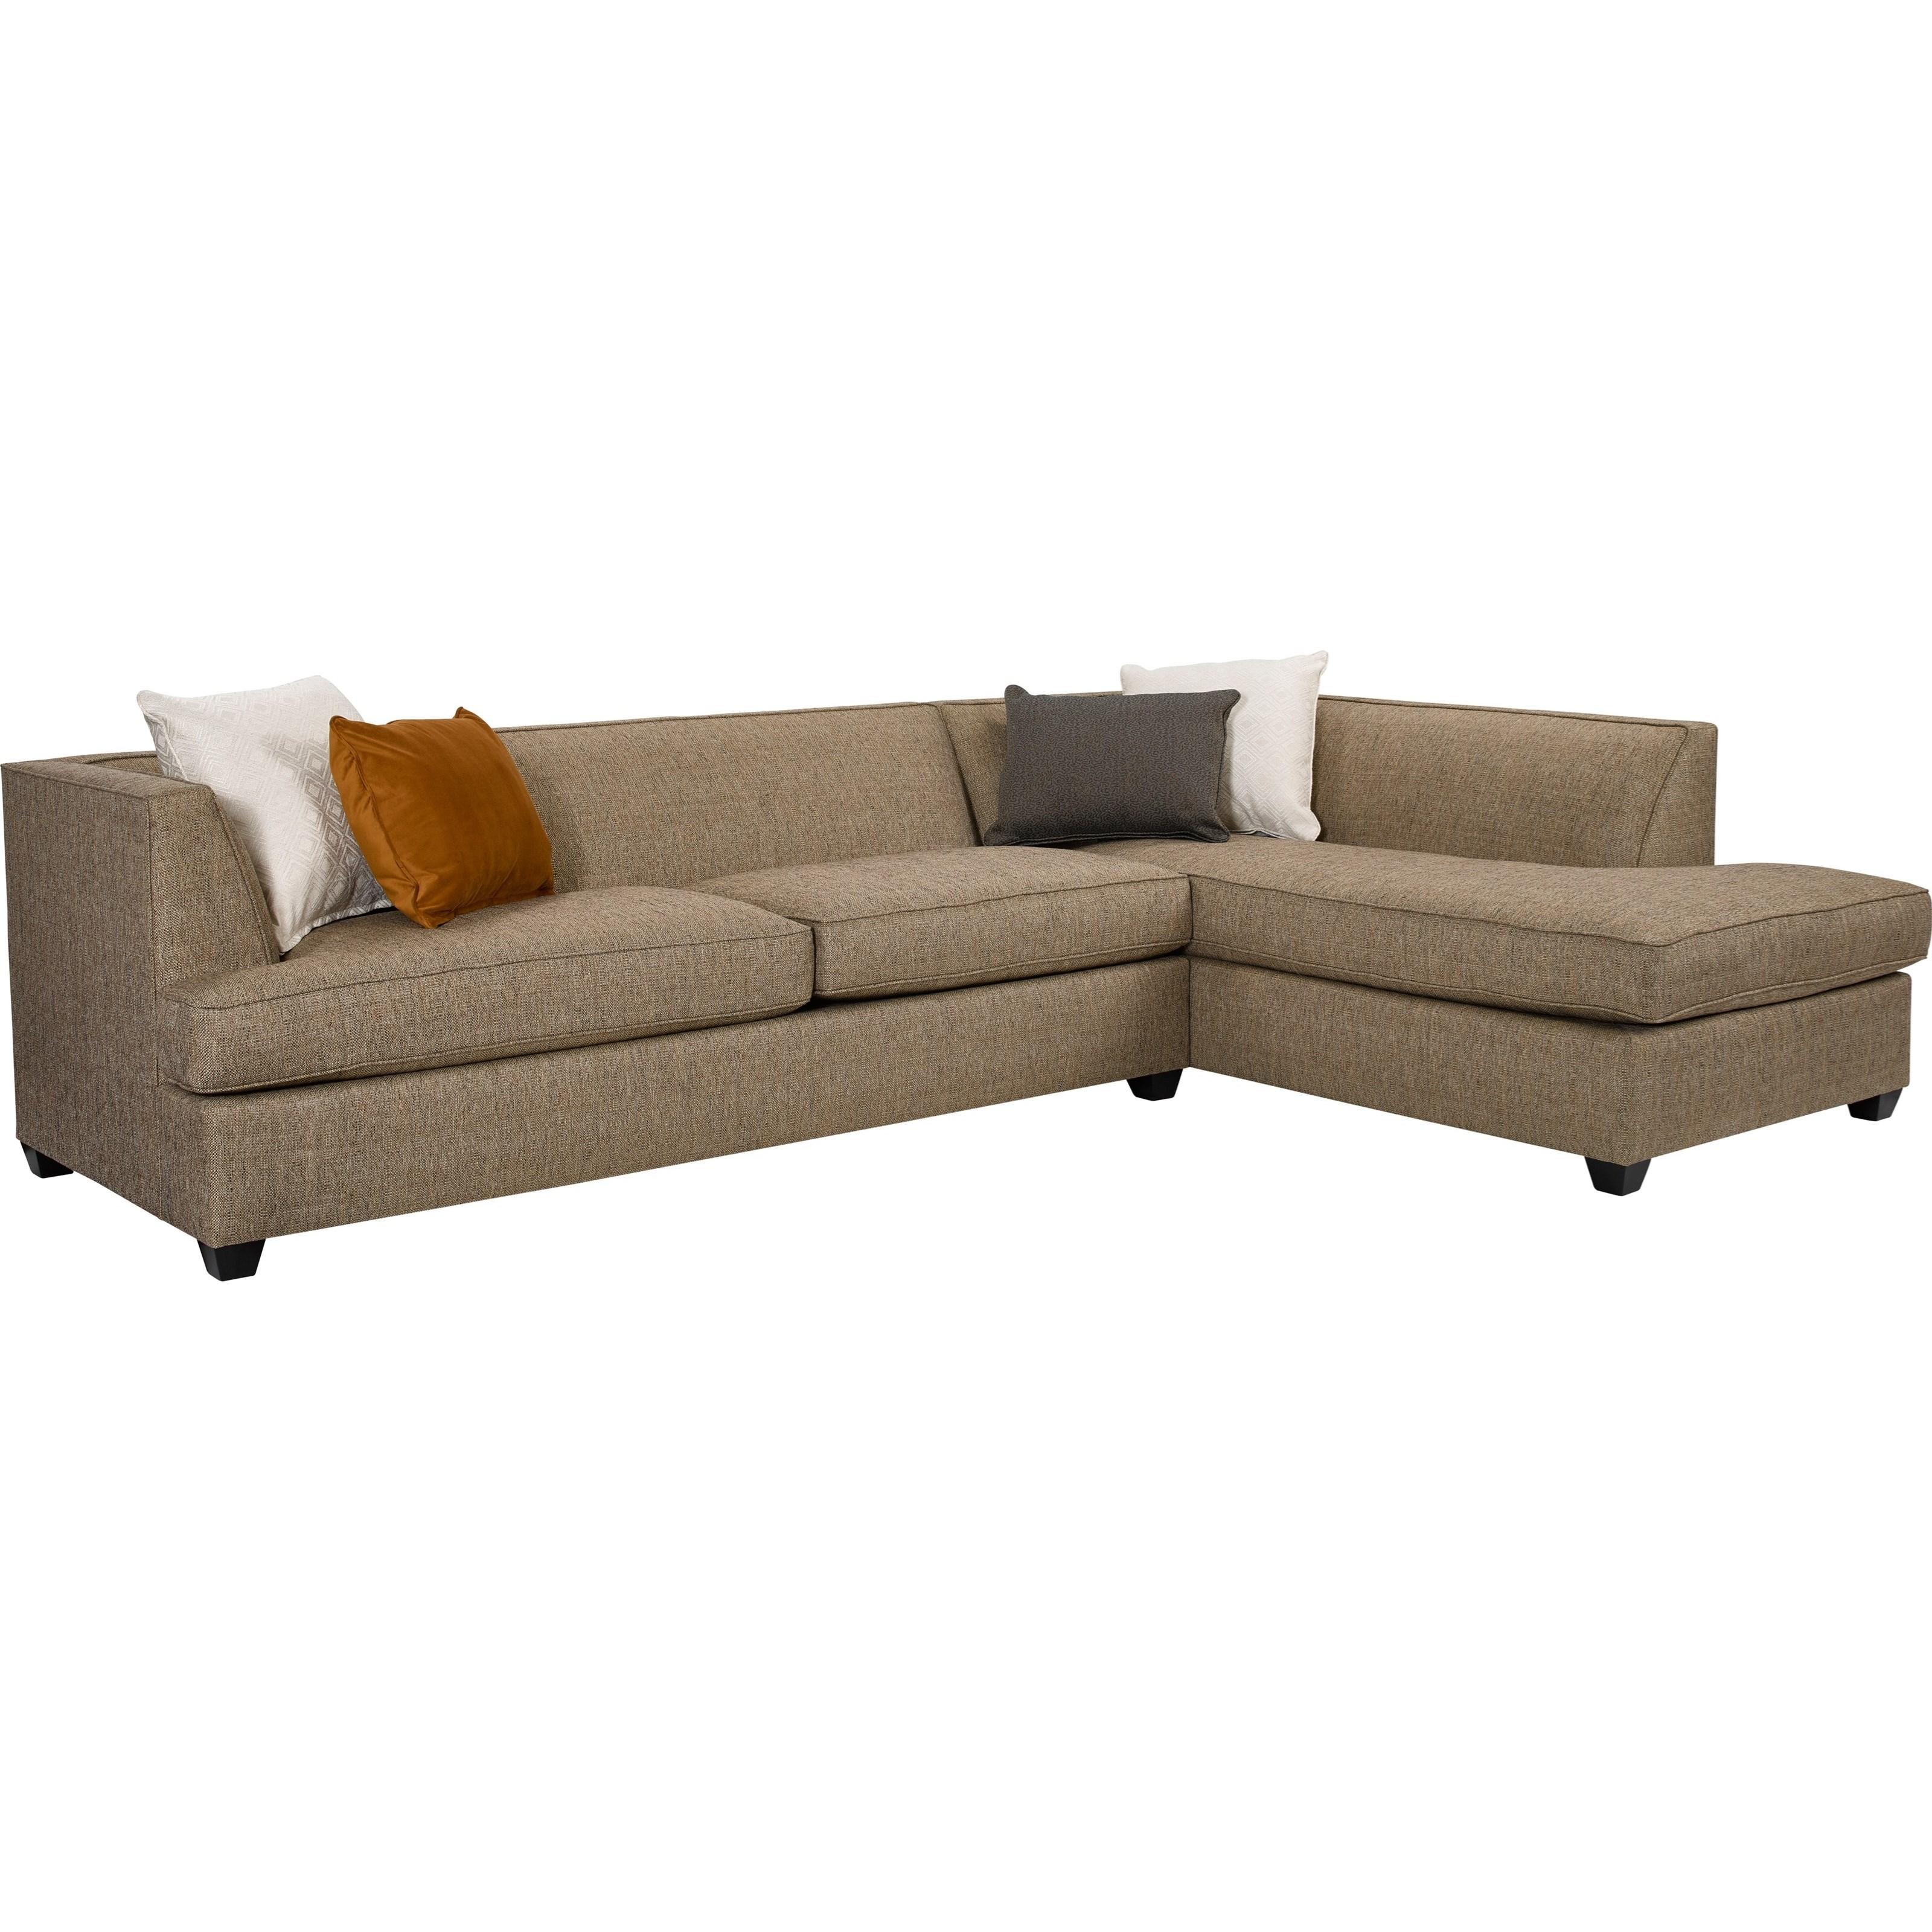 Broyhill furniture farida 2 piece sectional sofa with raf for Broyhill sectional sofa with chaise